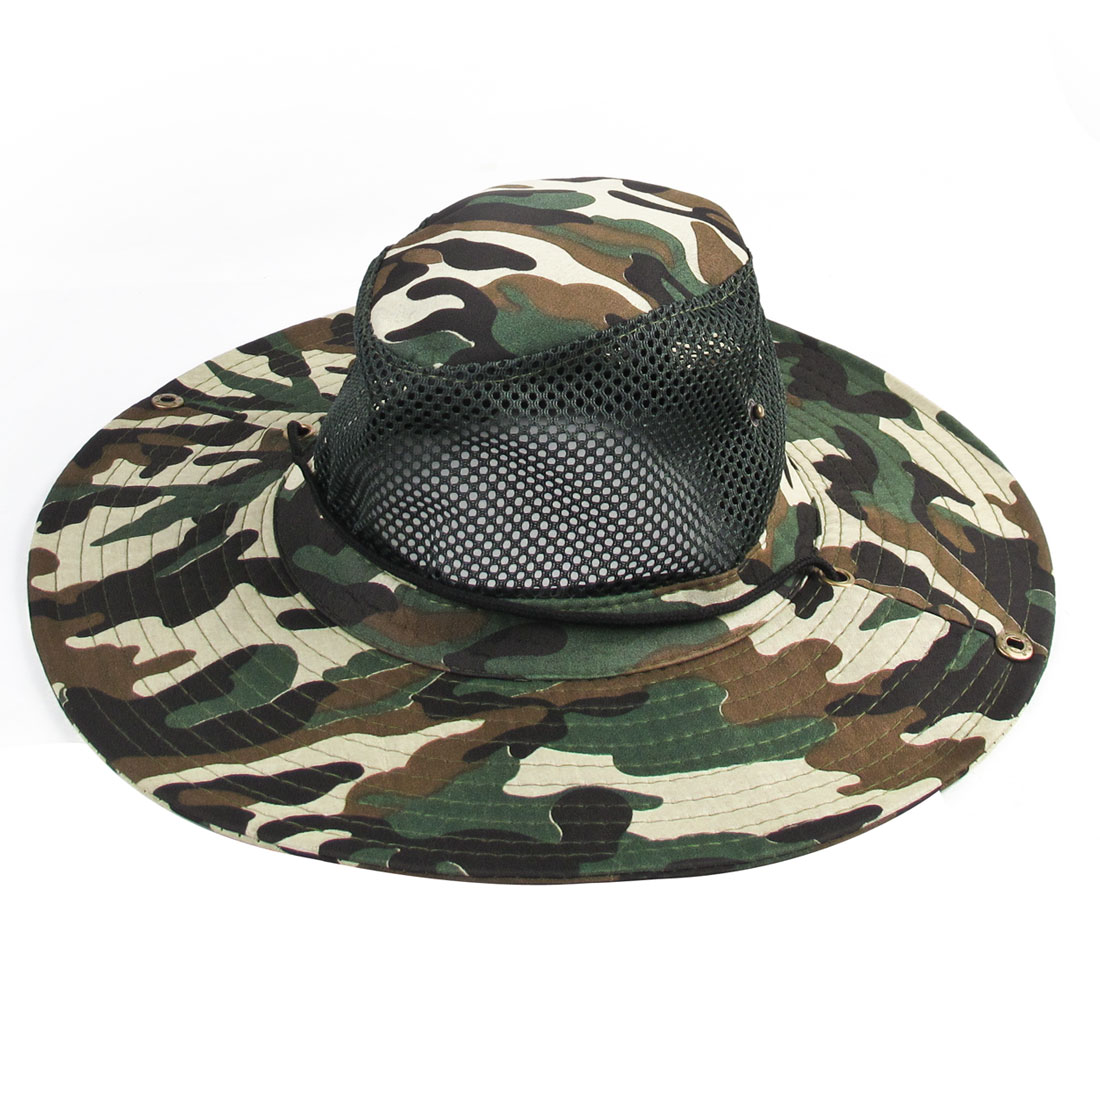 Outdoor Hiking Fishing Wide Brim Beige Green Camouflage Sun Hat for Men